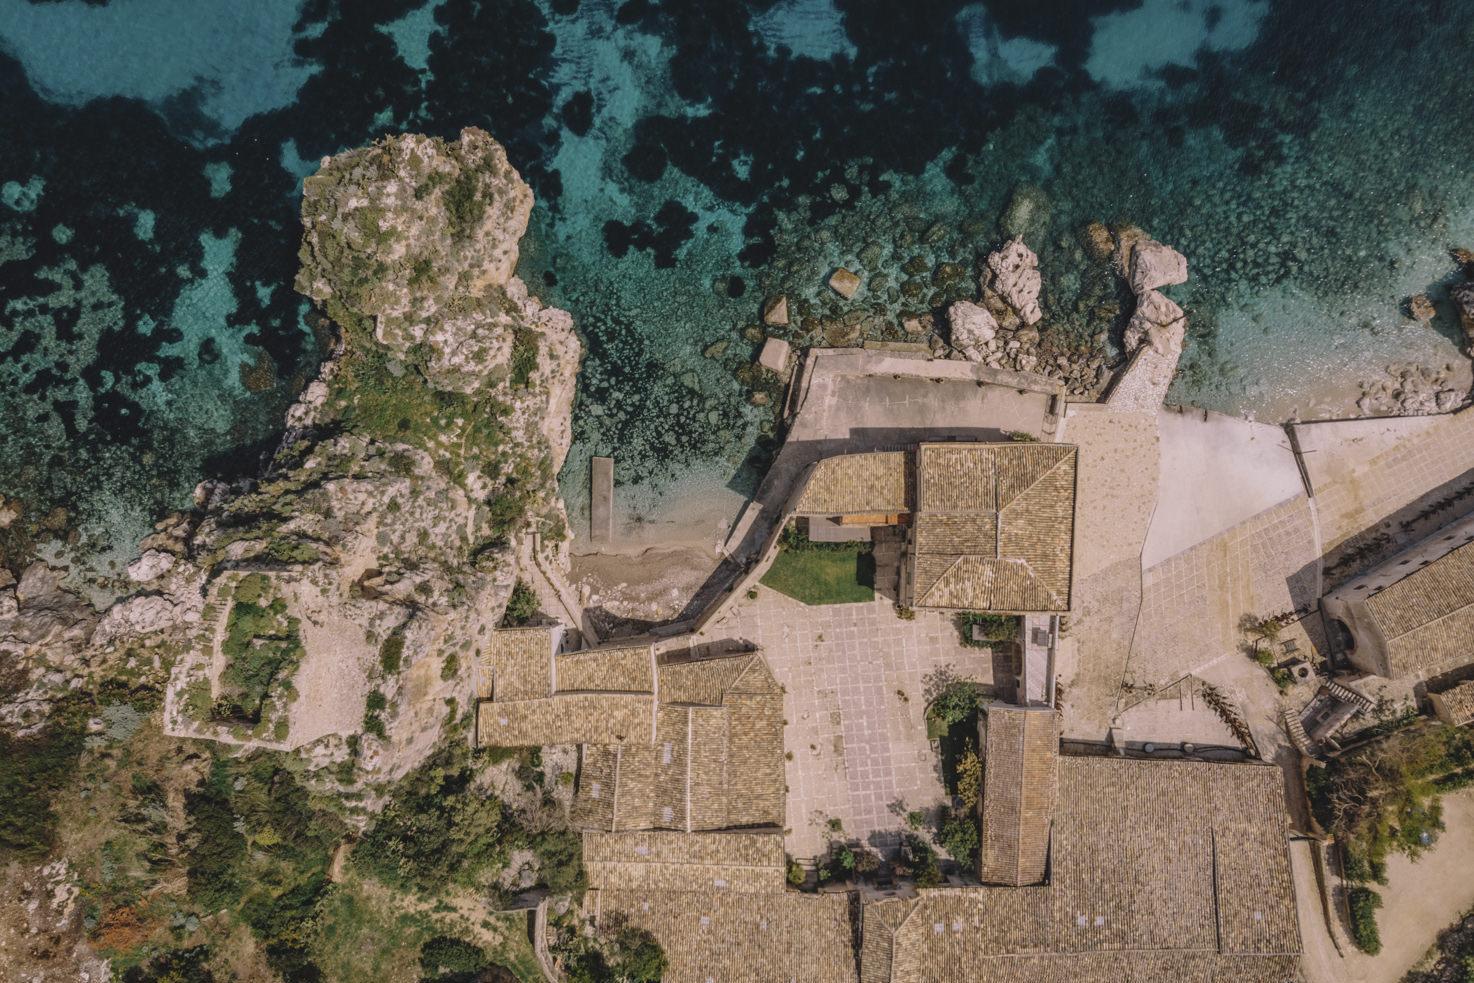 Aerial view of Tonnara di Scopello